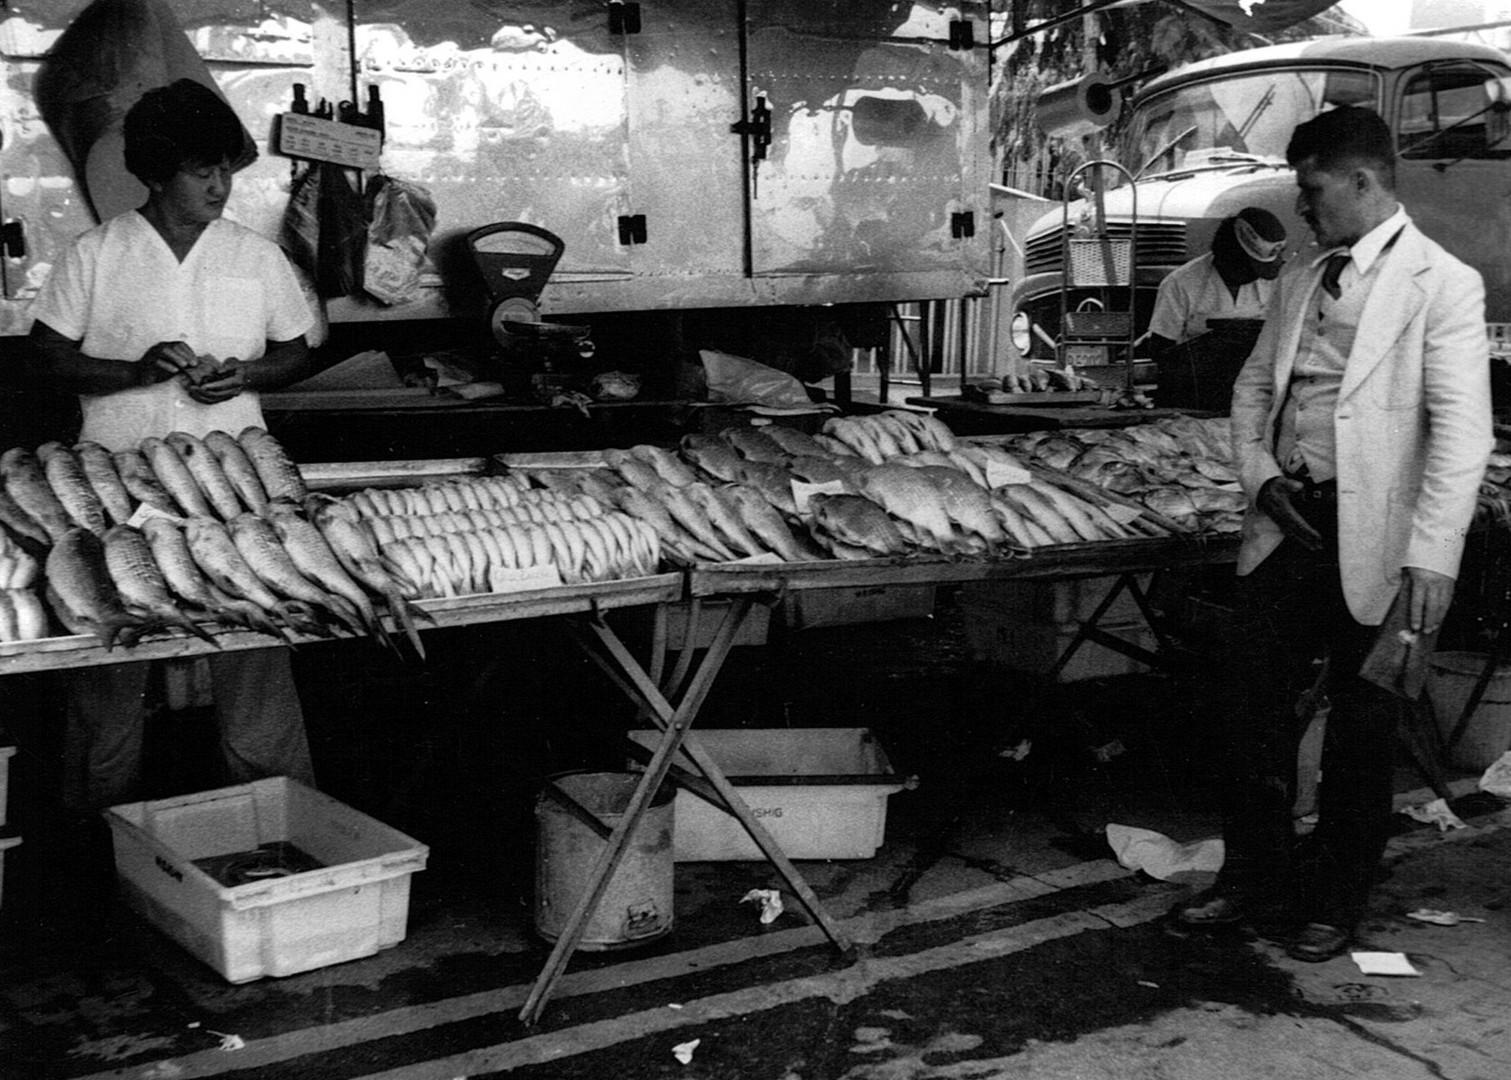 Homem de terno e peixeiro